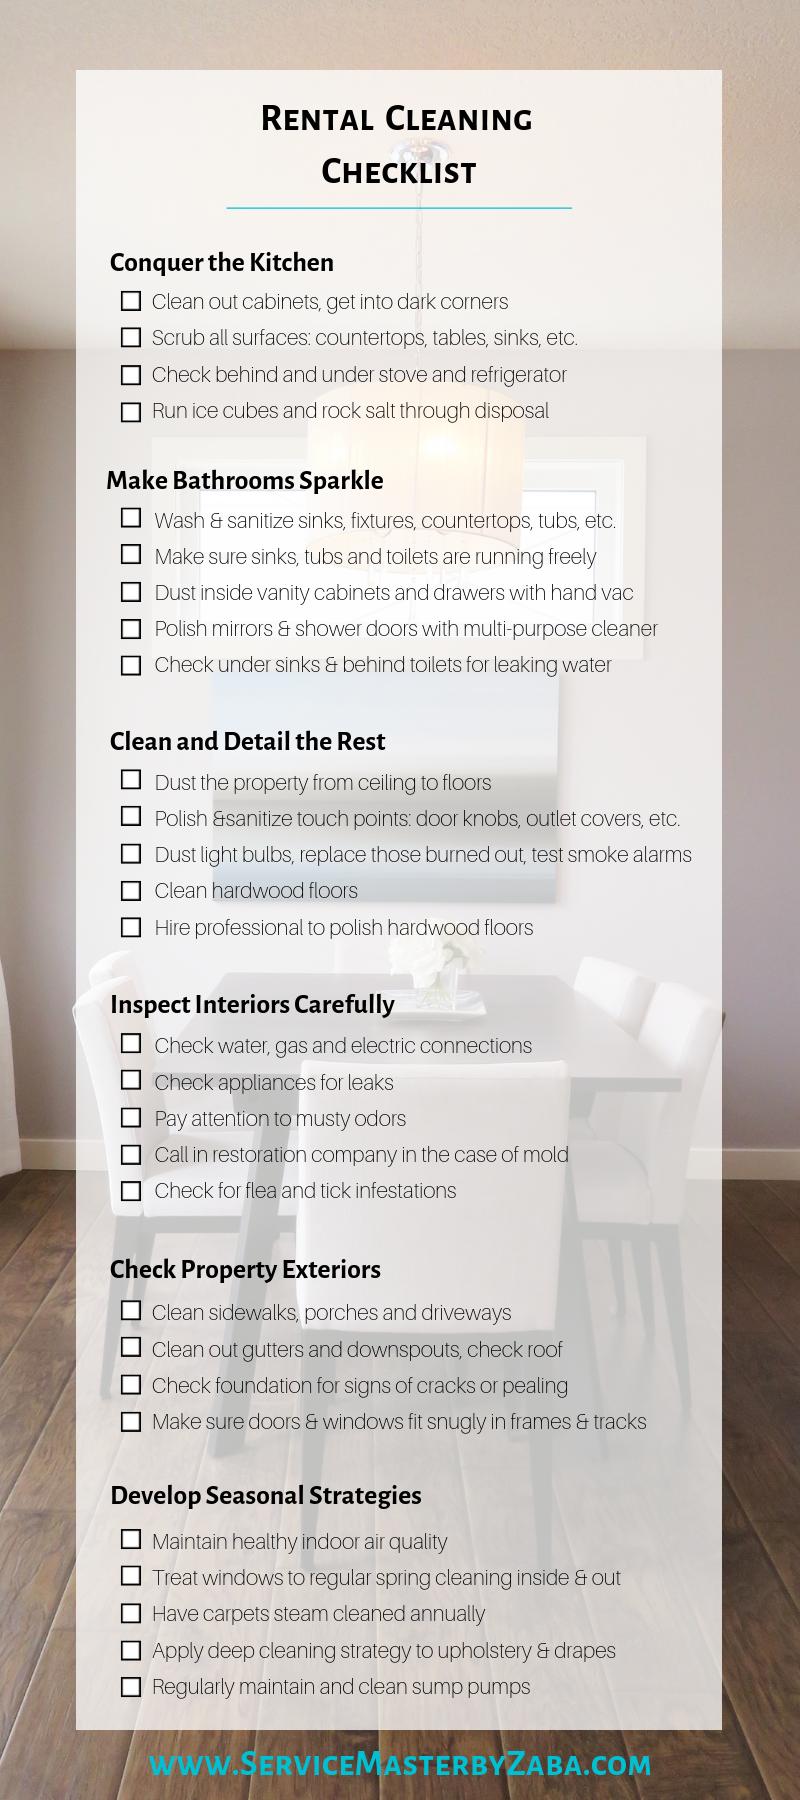 rental cleanout checklist